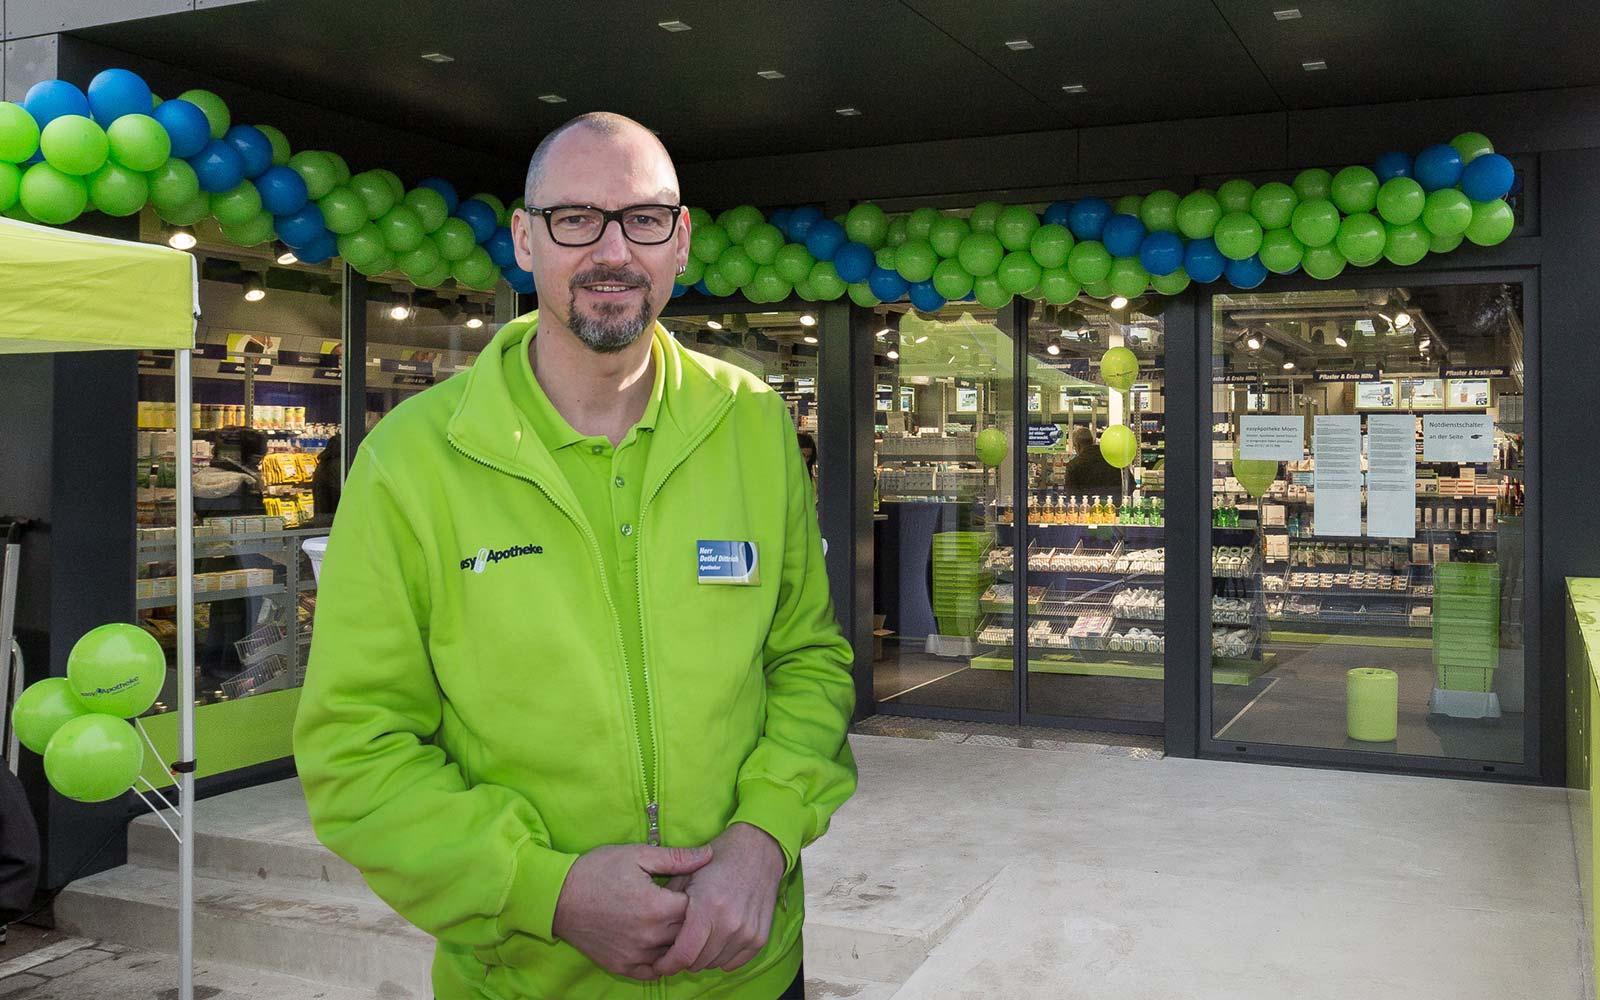 Apotheker Detlef Dittrich vor seinem easyApotheke Modul in Moers